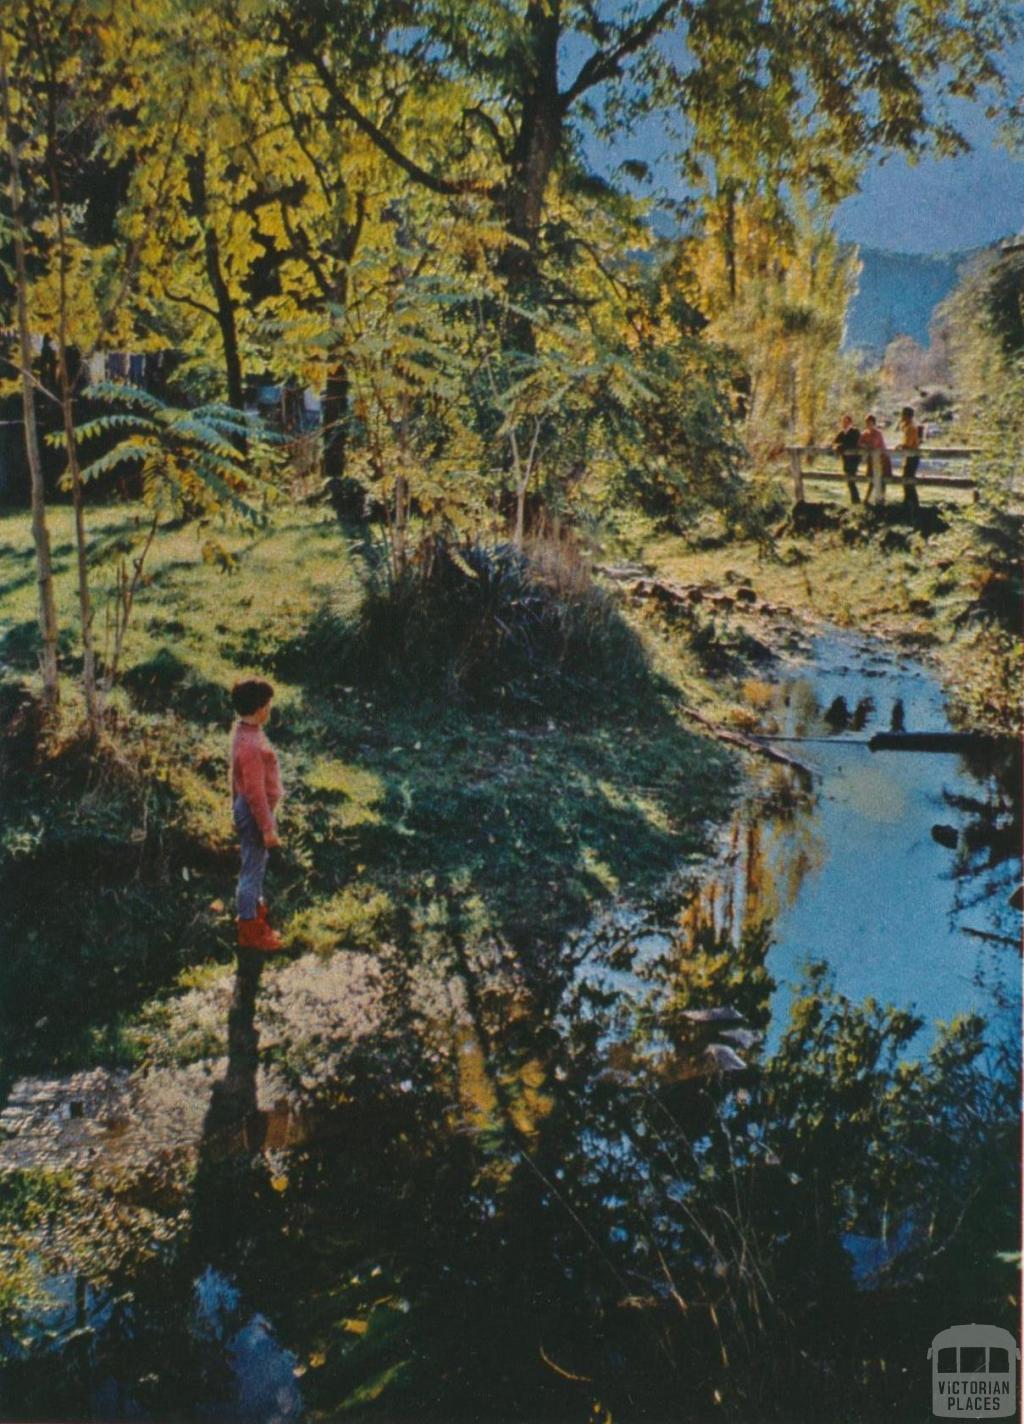 Stringer's Creek, Walhalla